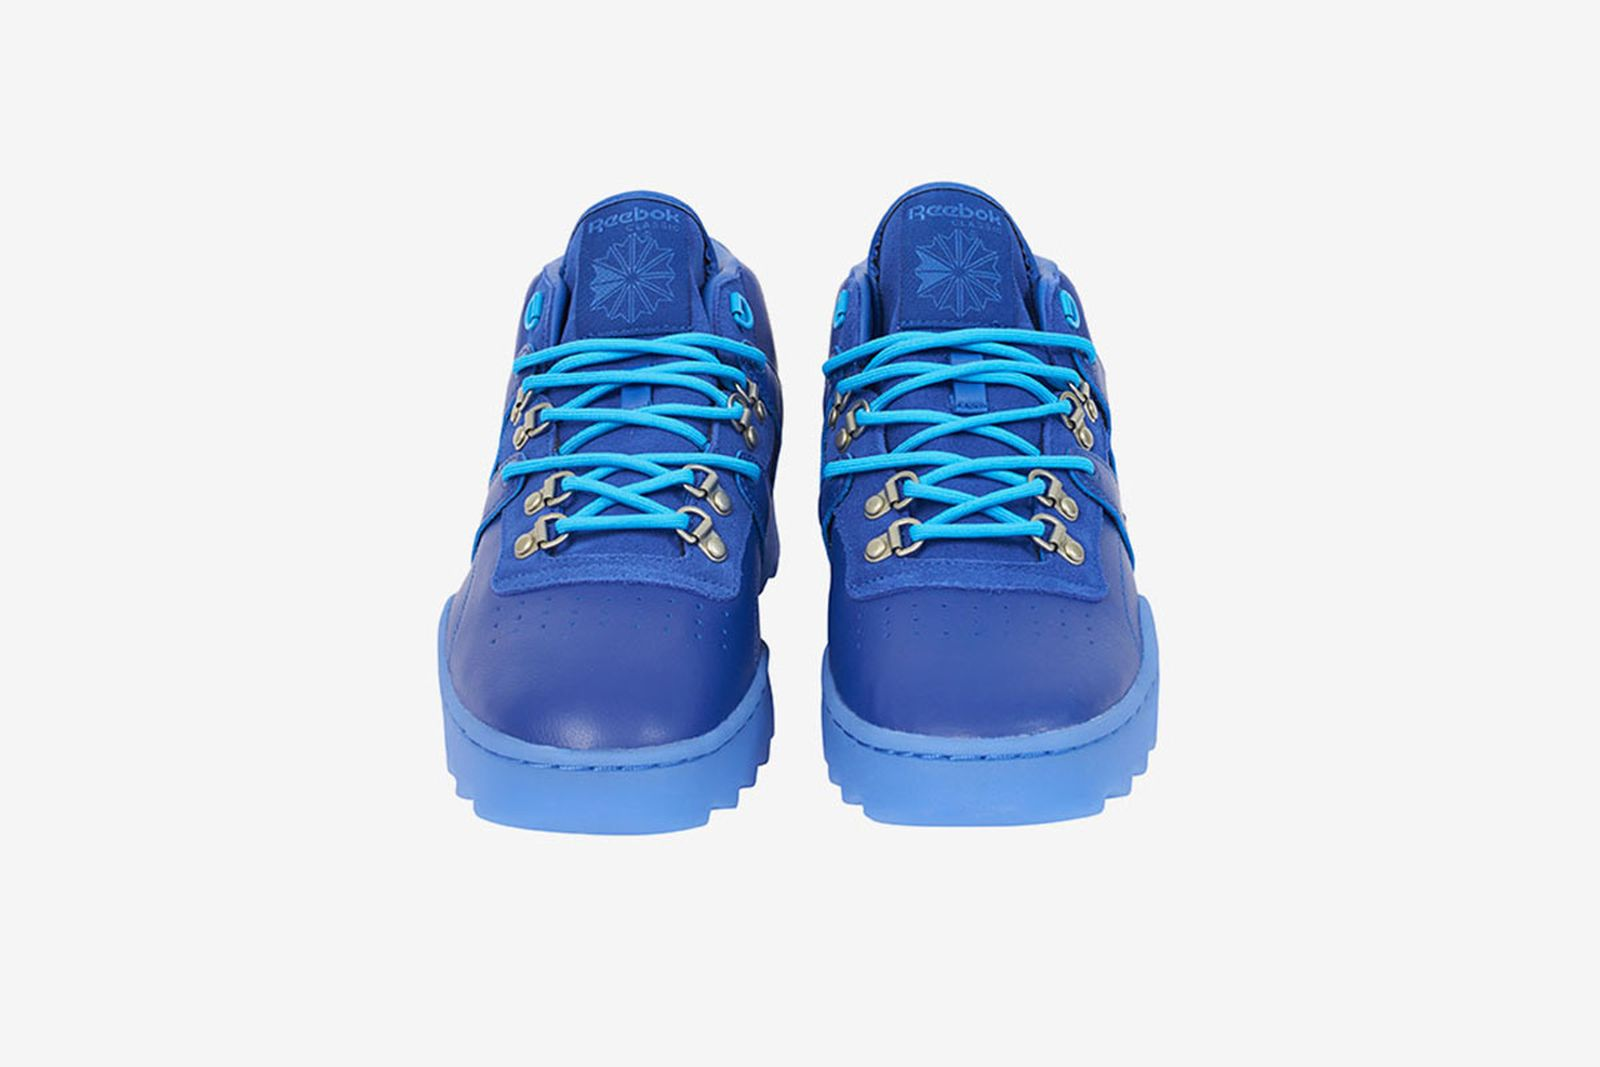 jugar pasillo mil millones  Palace x Reebok's Winter-Ready Sneaker Drops Tomorrow